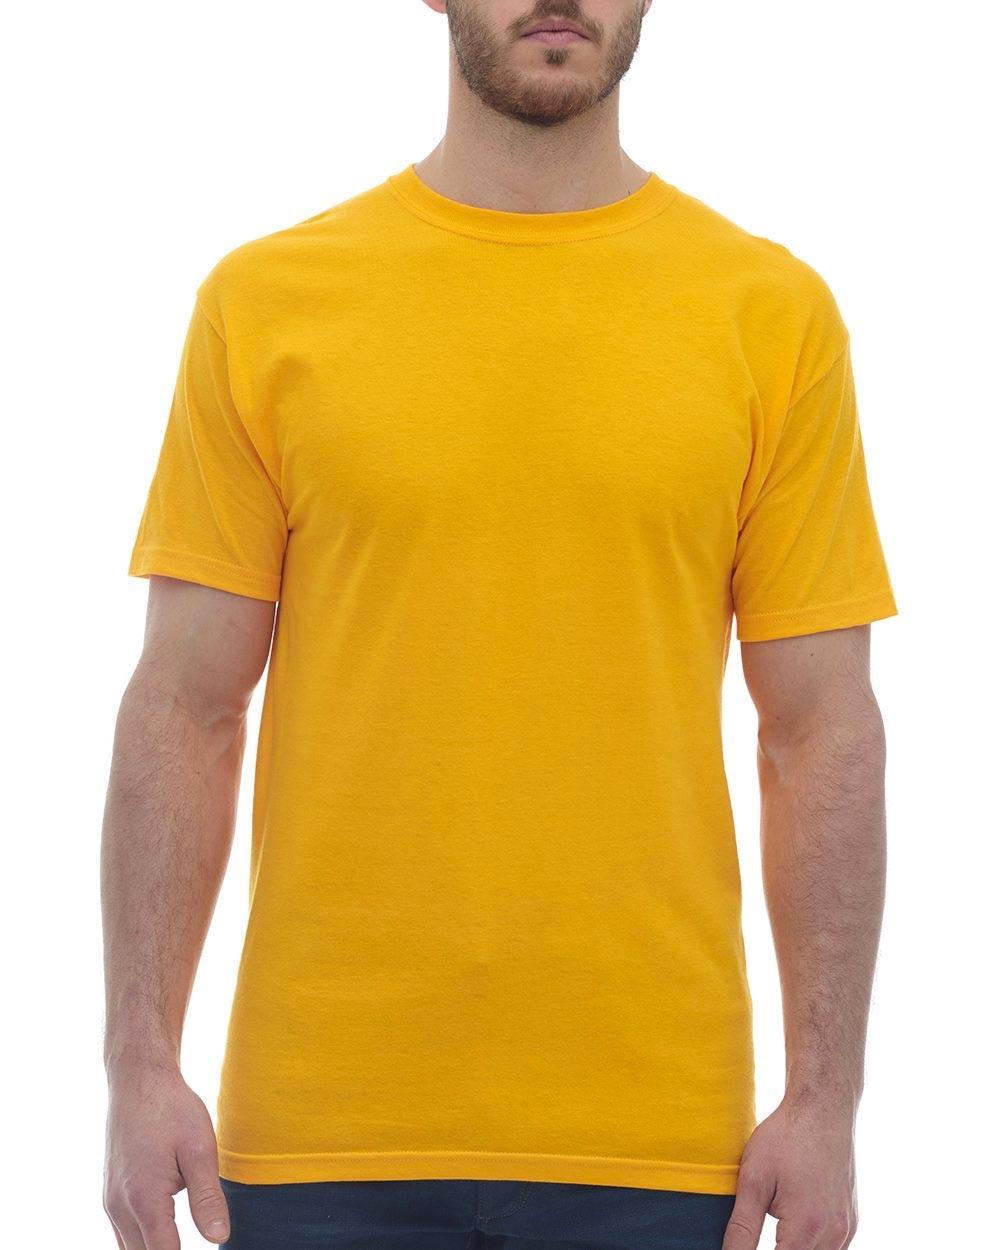 M&O Knits 4800 - Gold Soft Touch T-Shirt